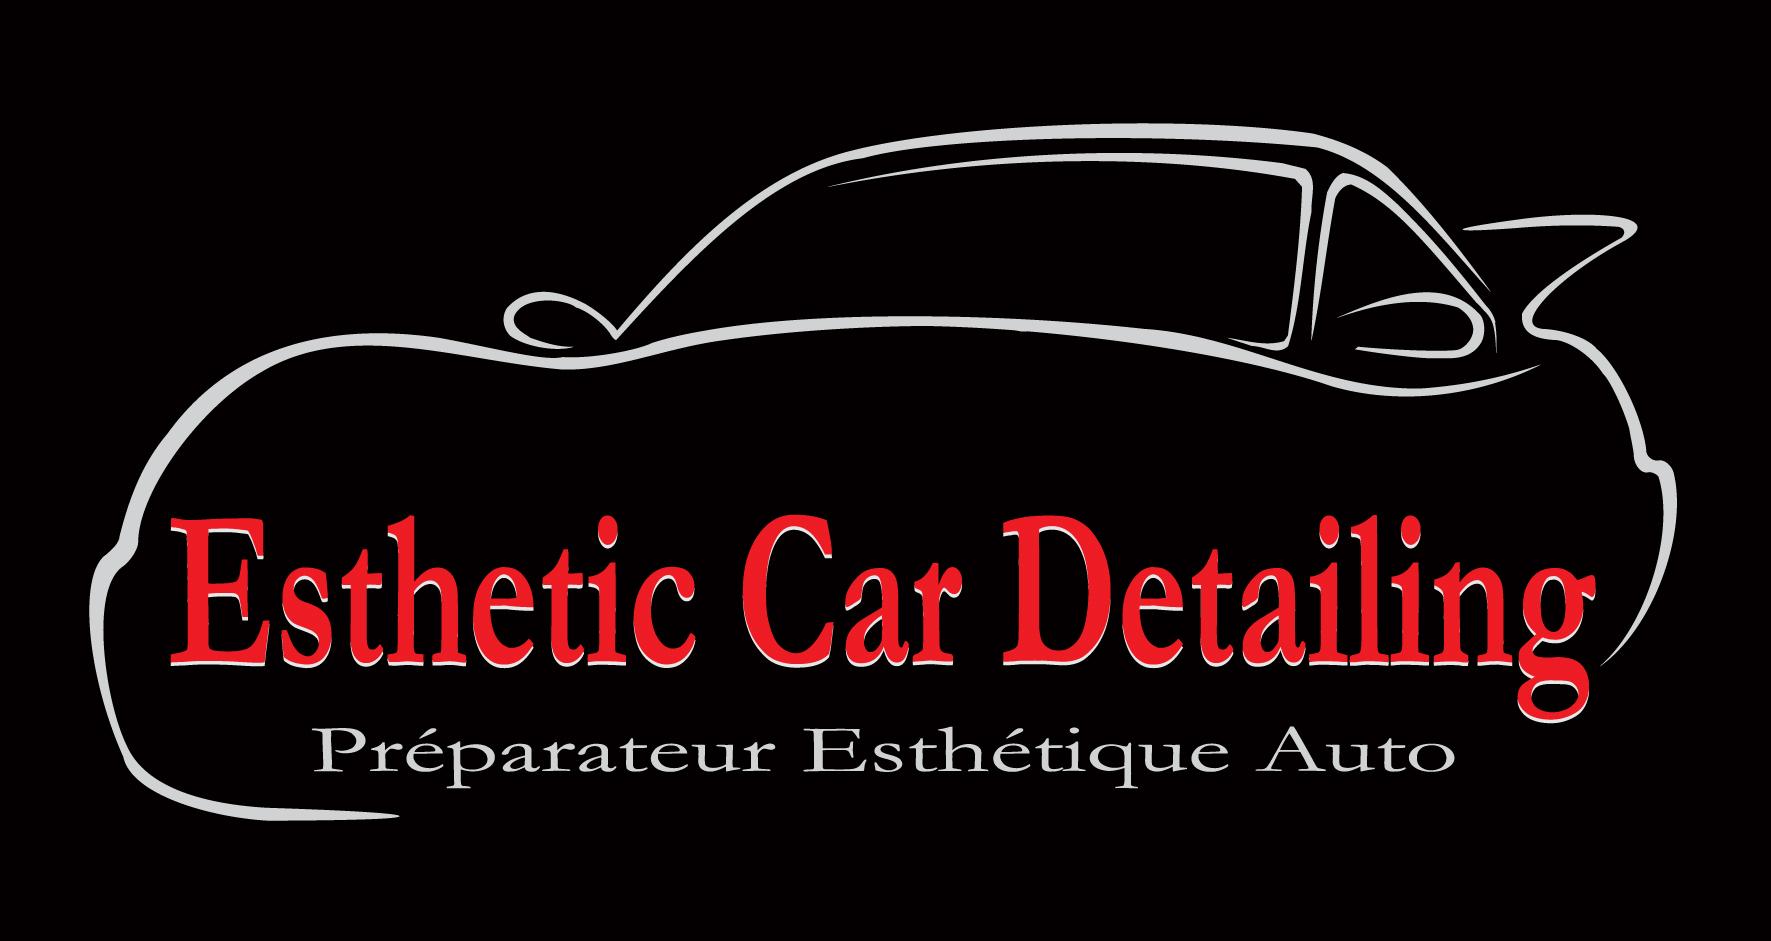 Esthetic car detailing